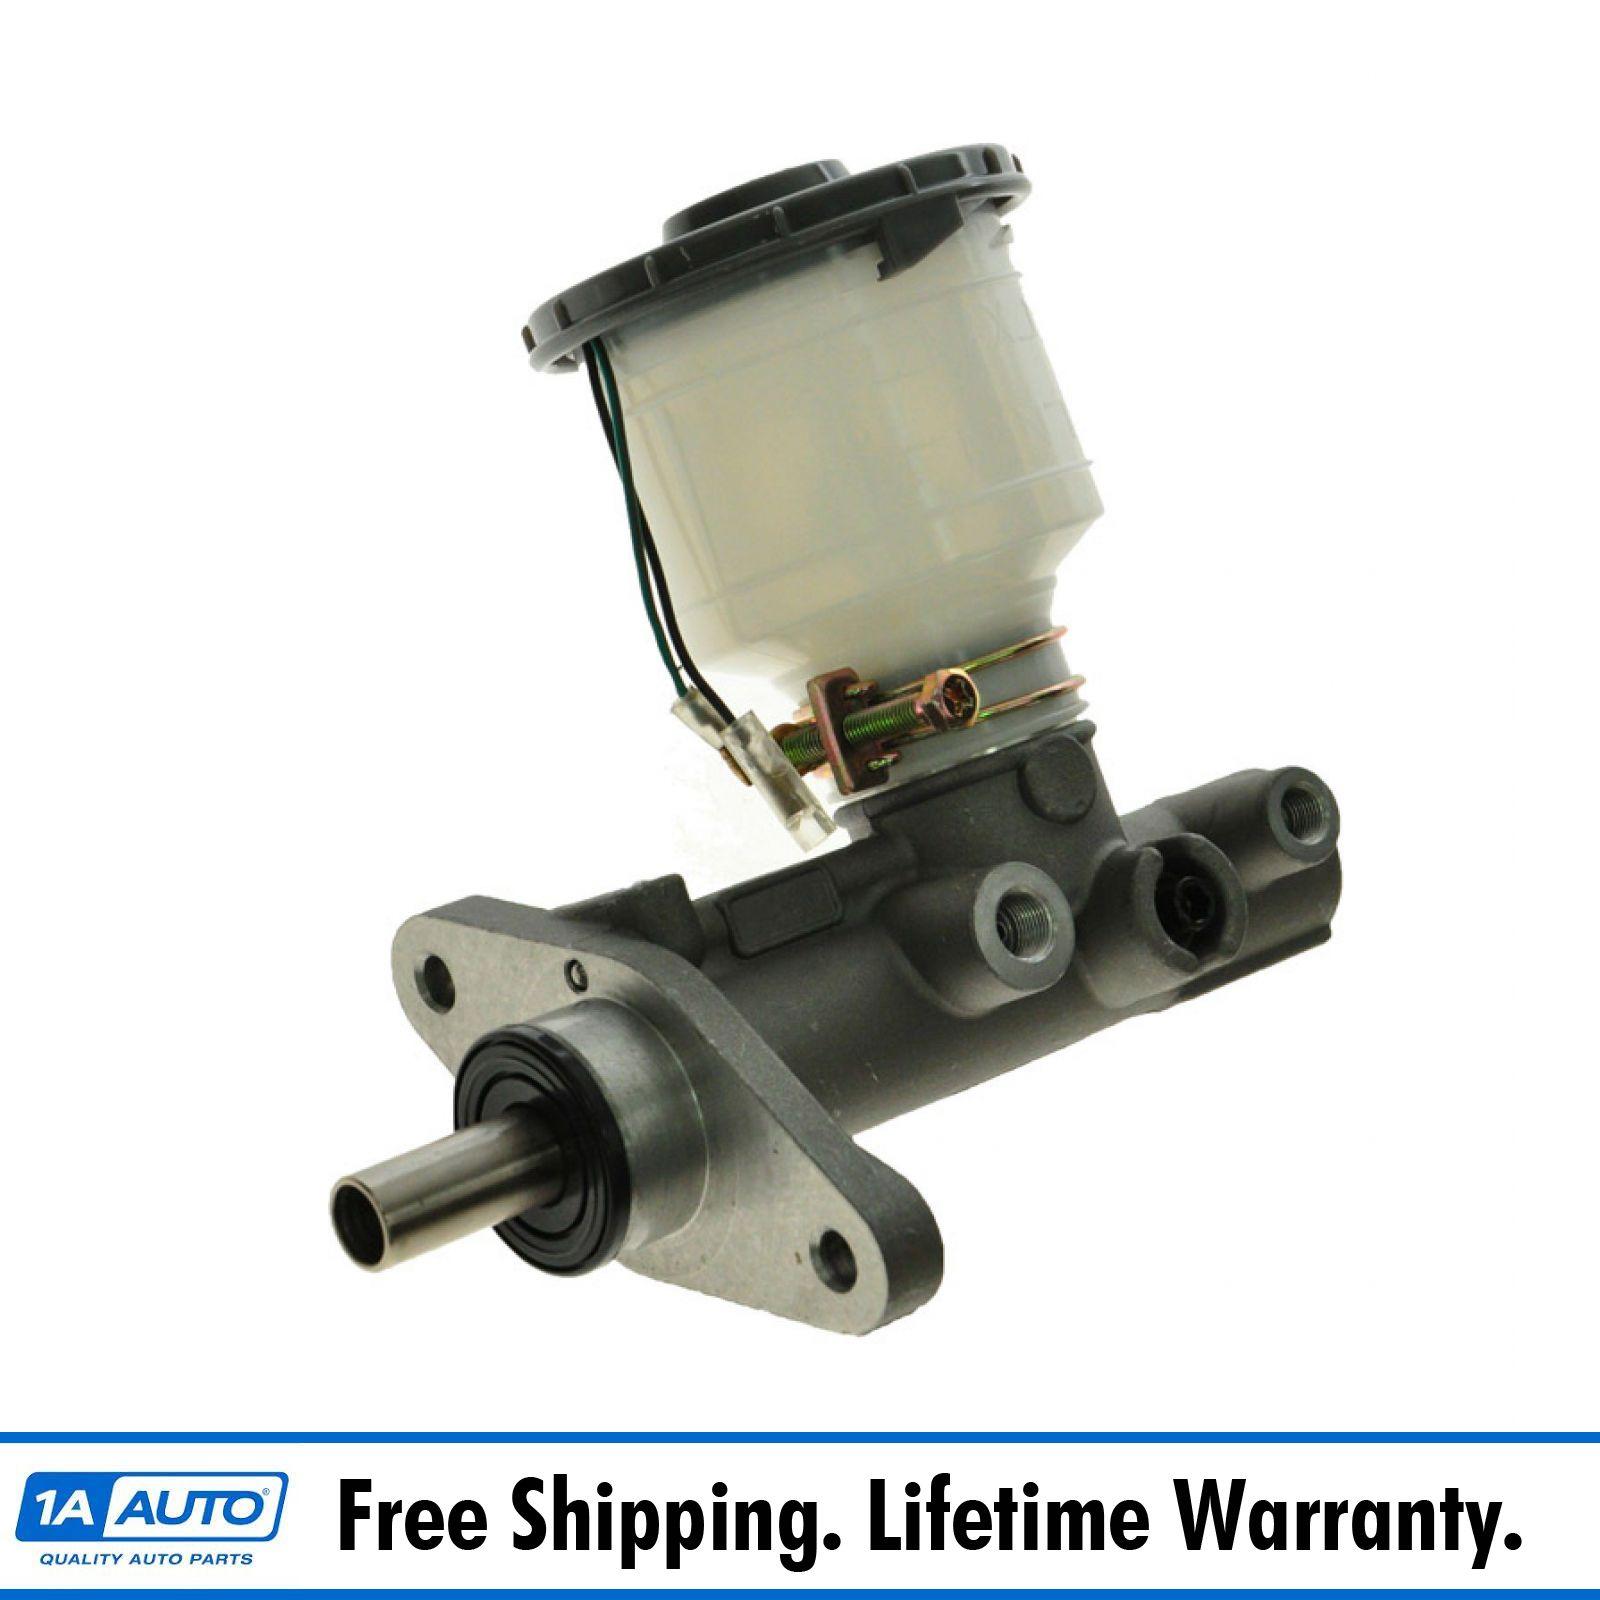 Brake Master Cylinder NTP for Acura CL TL Vigor Honda Odyssey Isuzu Oasis NEW